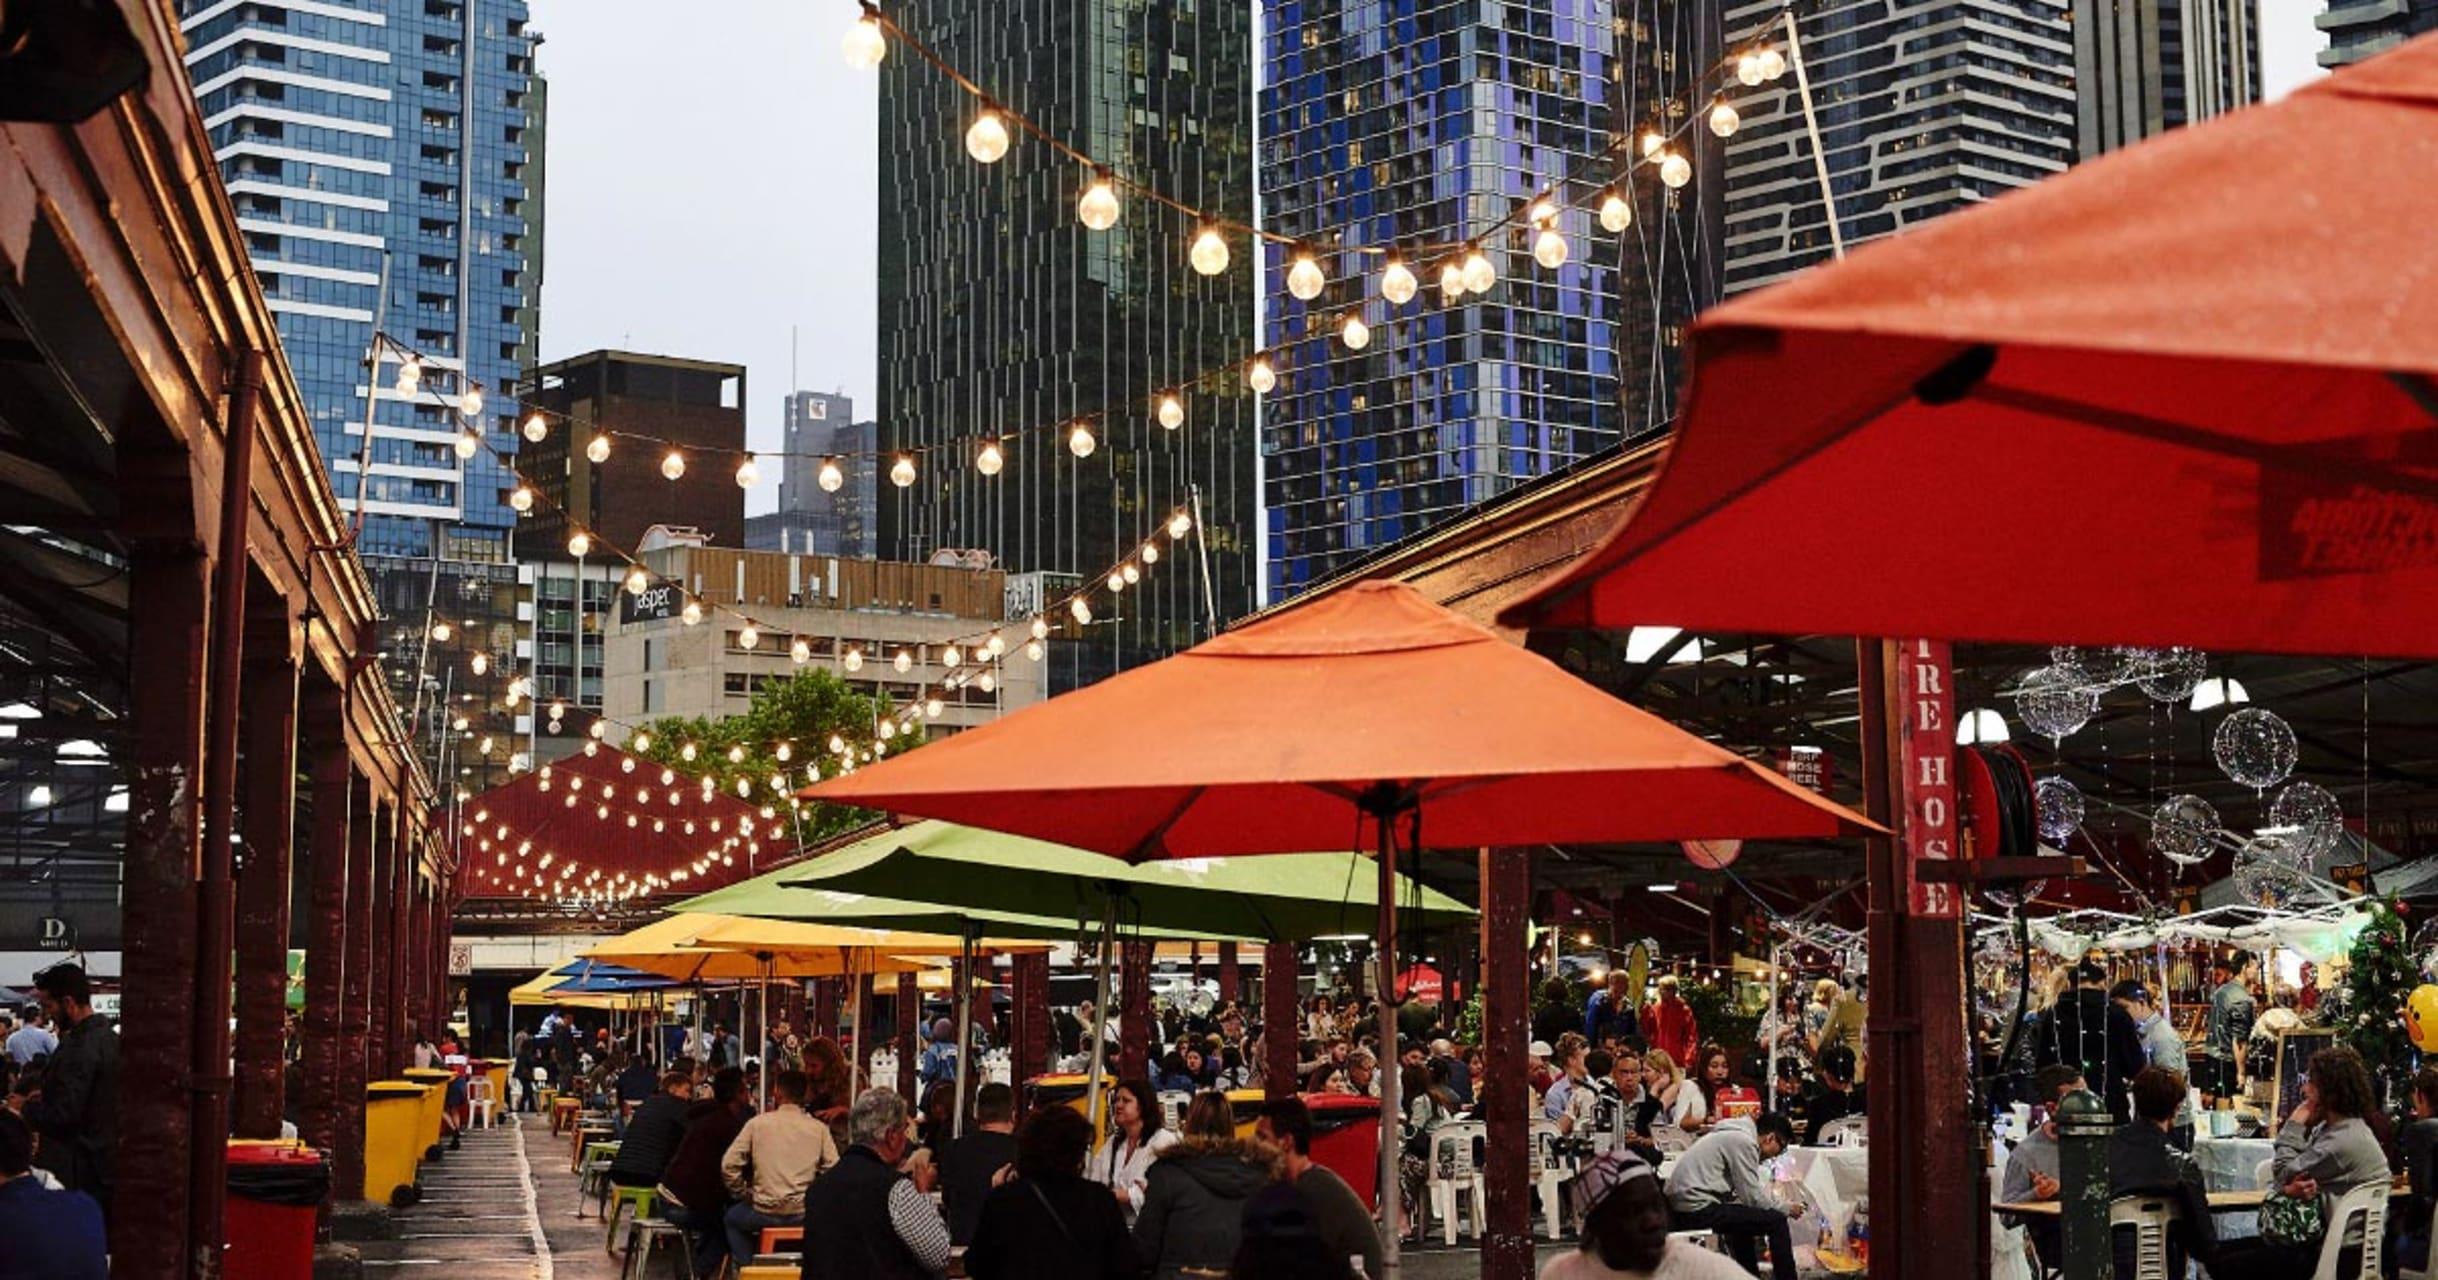 Melbourne - Queen Victoria Night Market